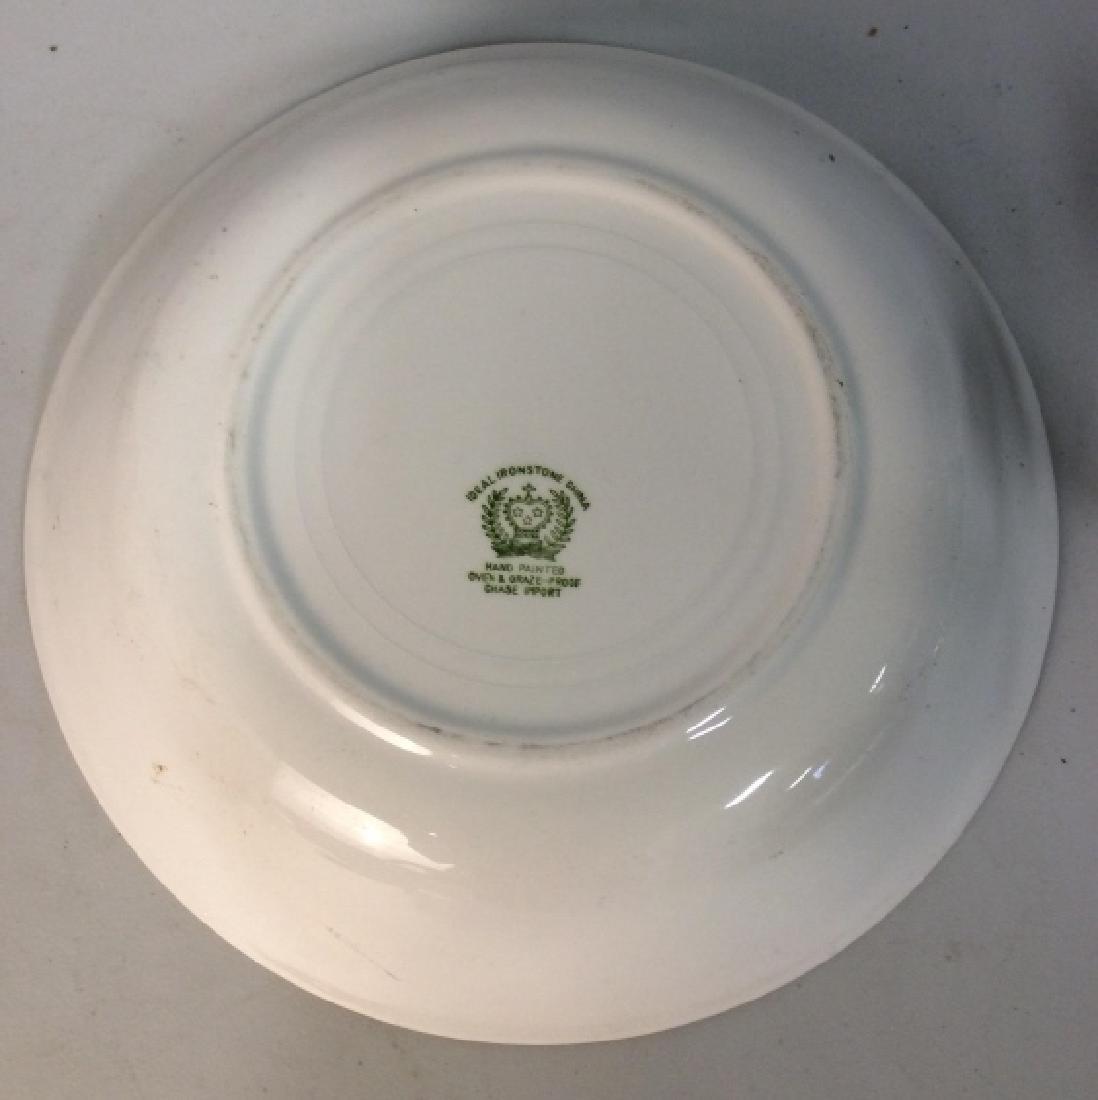 Ceramic Porcelain Hand Painted Serving Bowl - 4